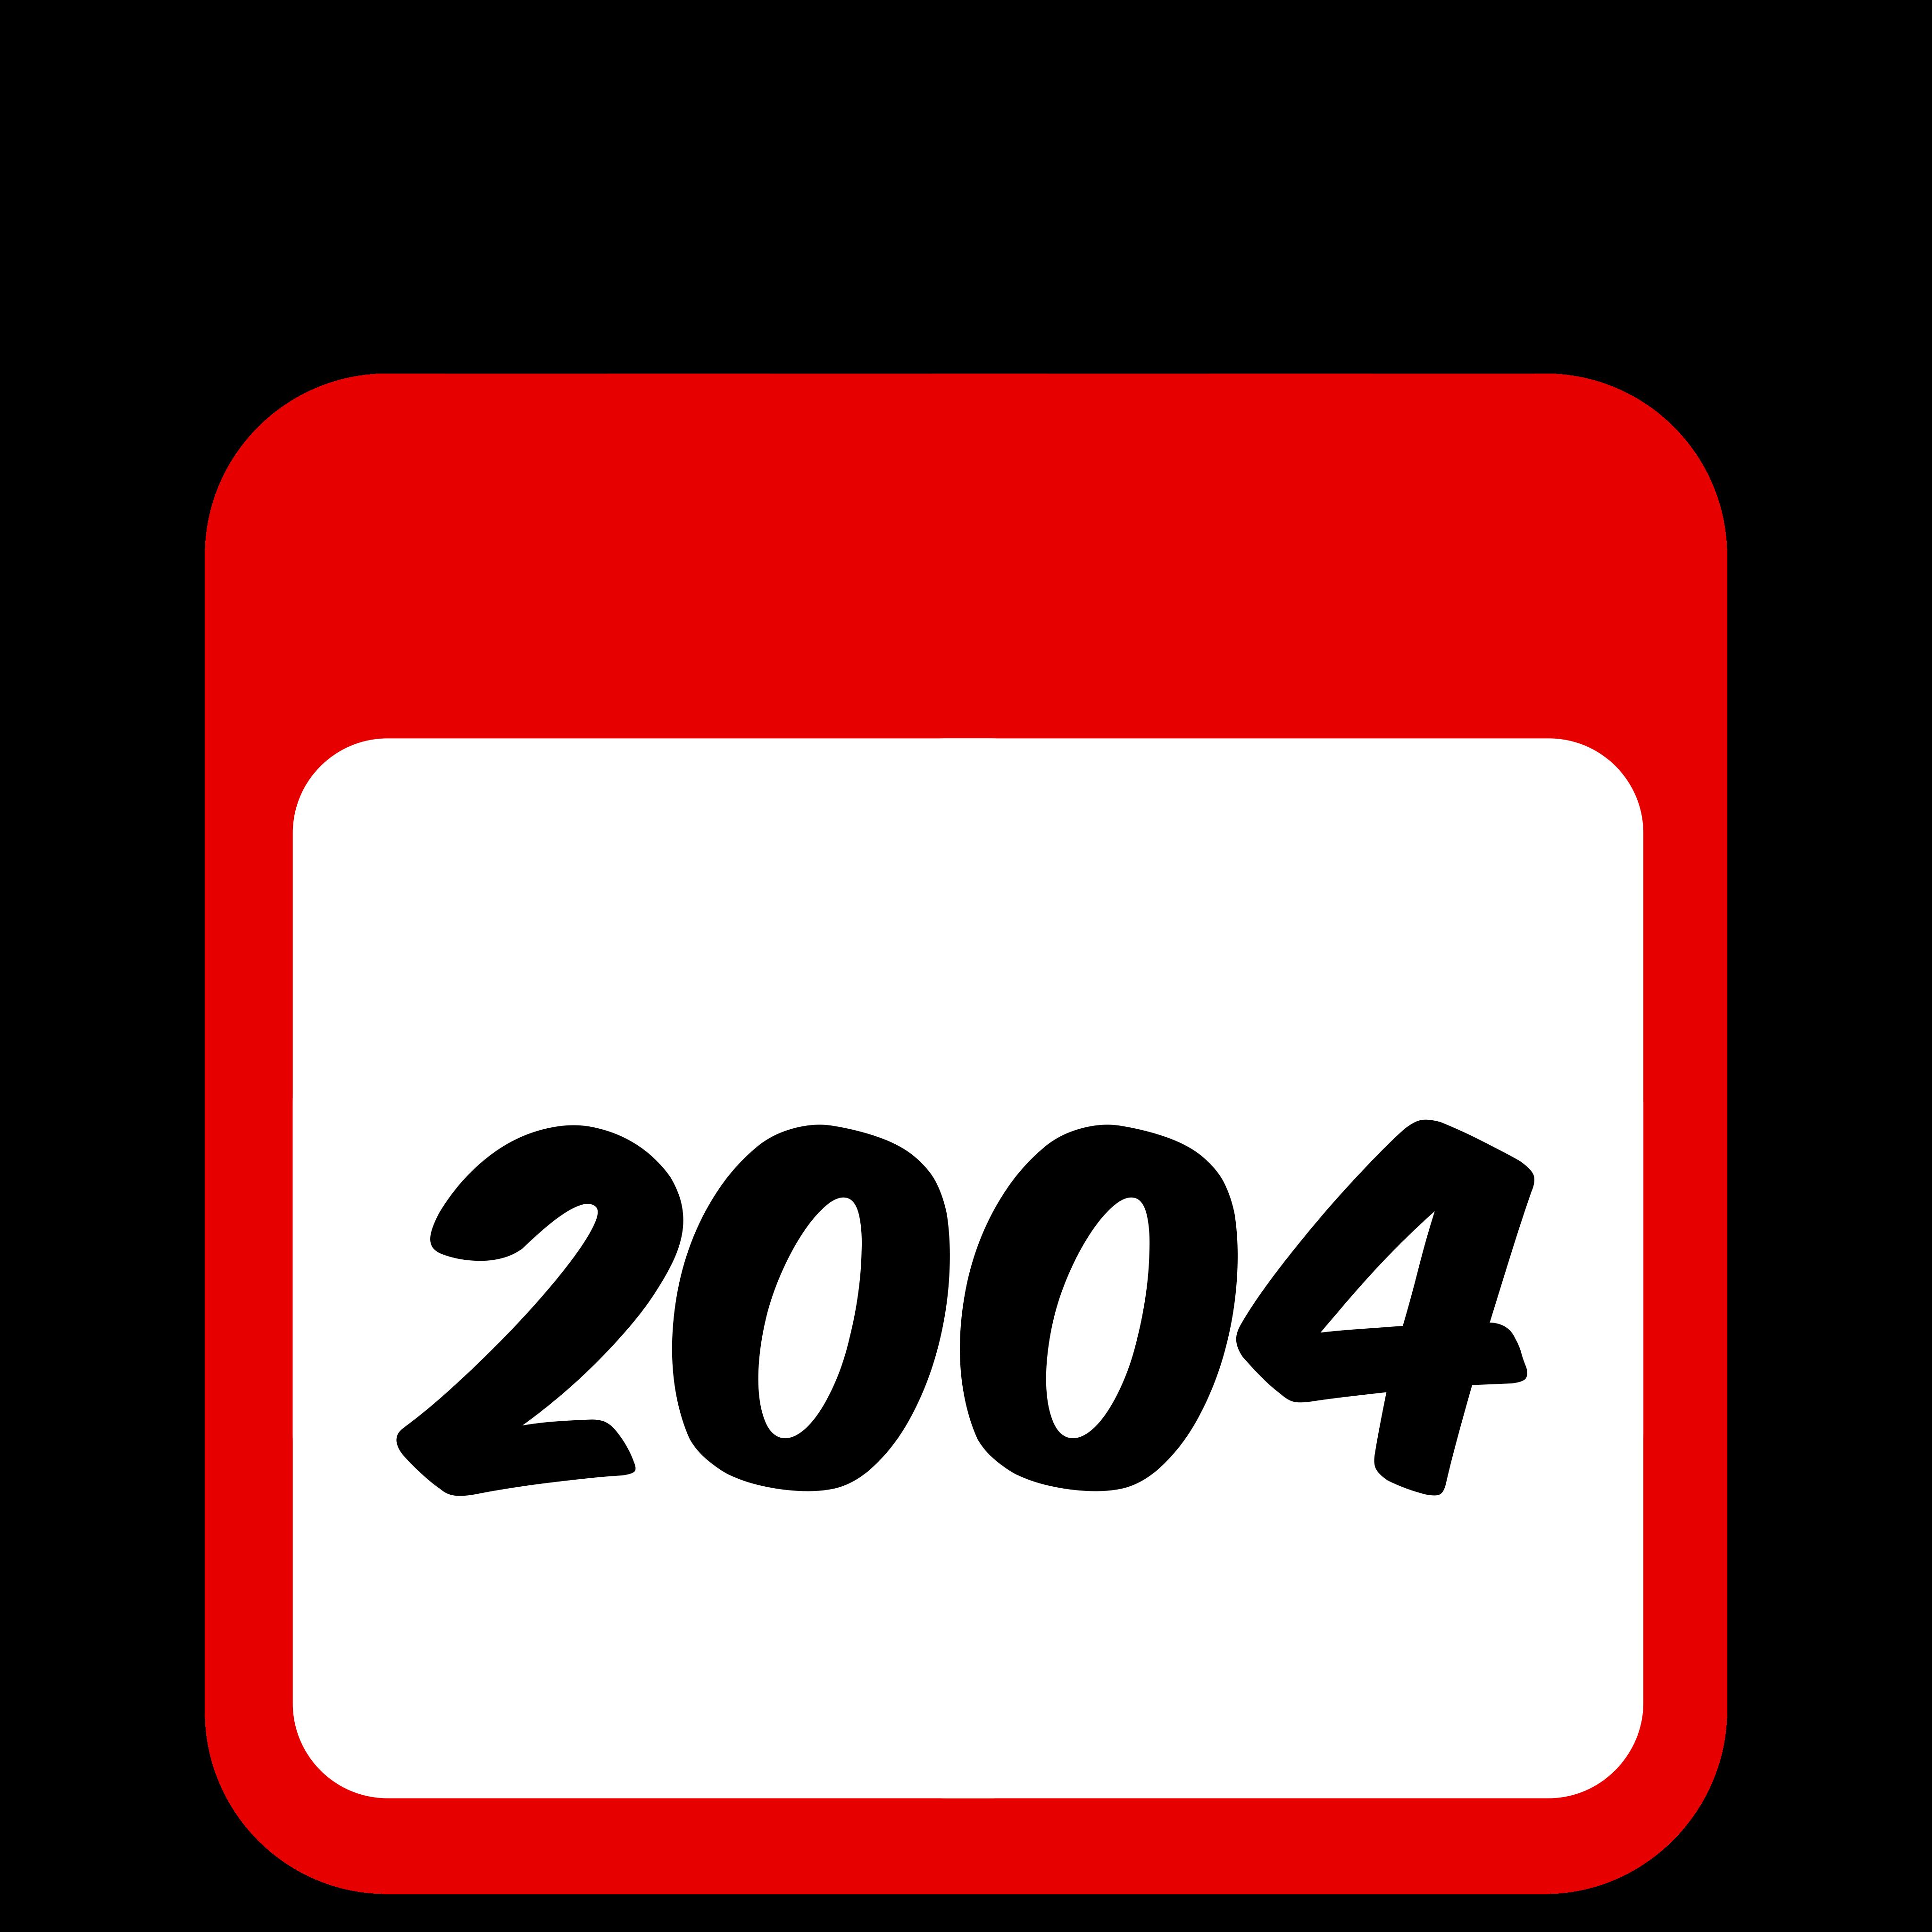 2004 Calendar Graphic